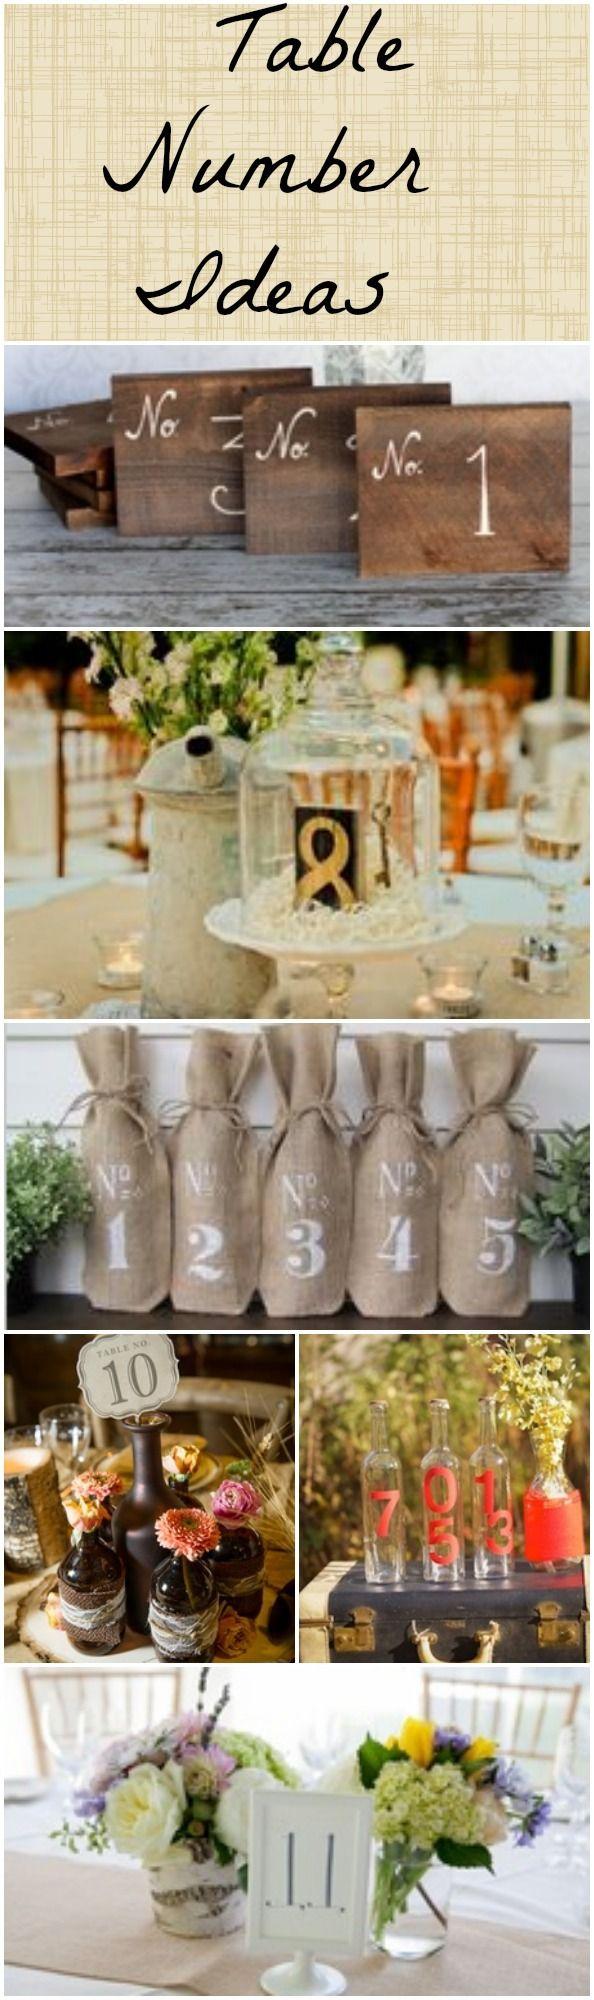 Butler barn wedding oregon   best Wedding misc images on Pinterest  Wedding inspiration